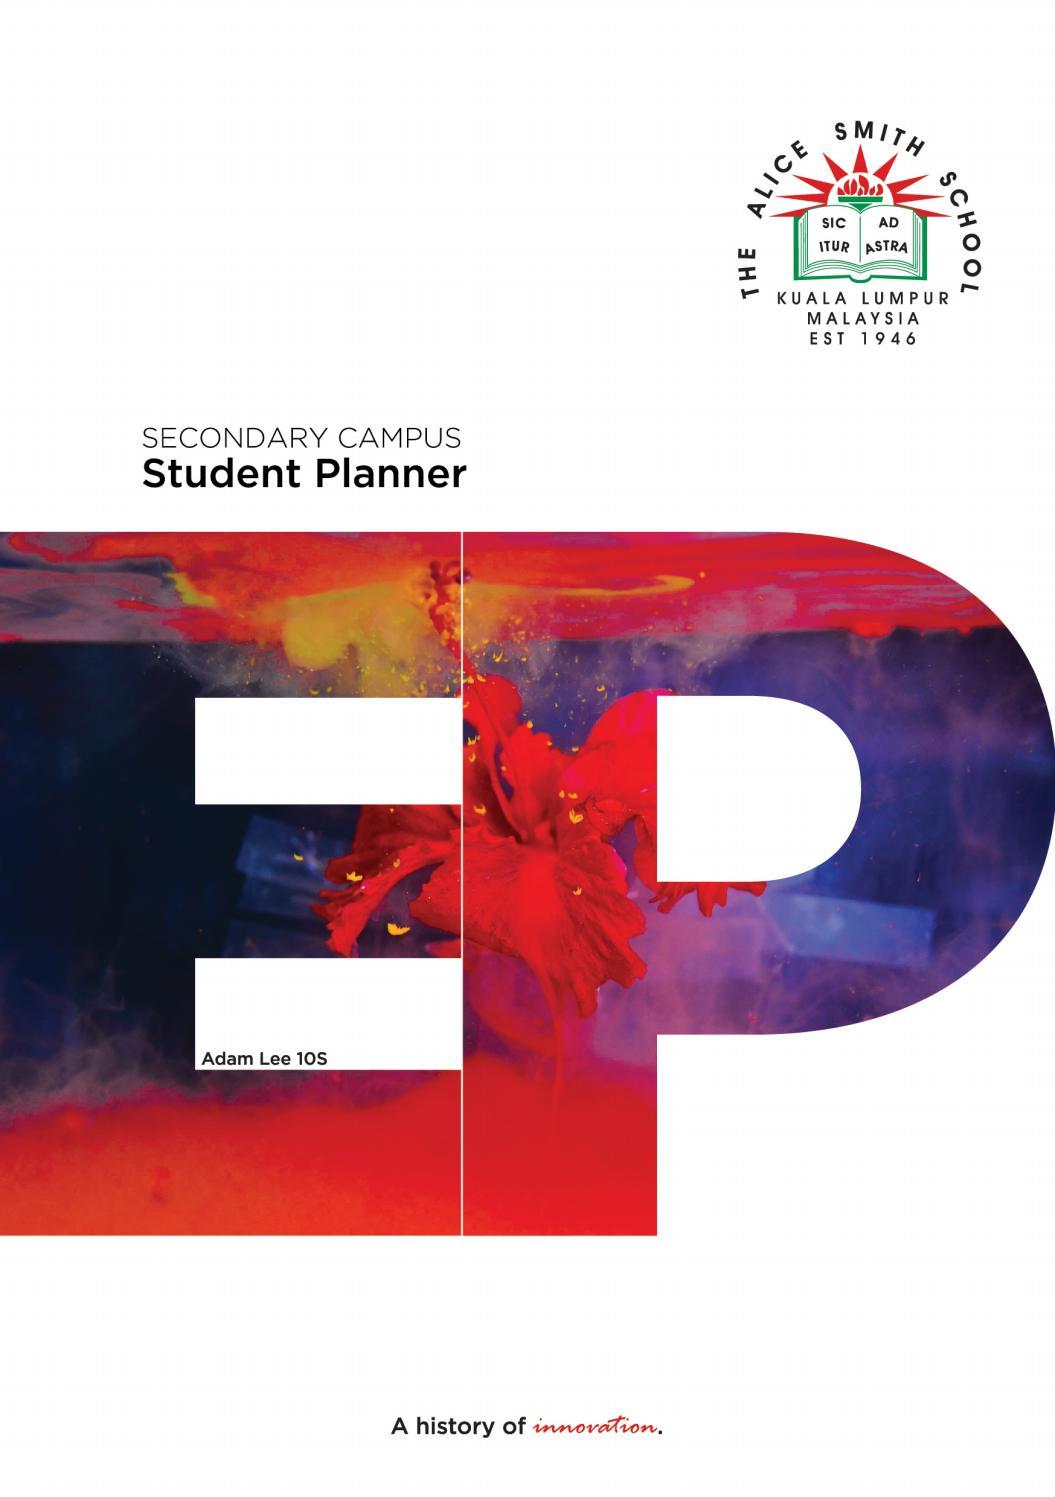 Klass Student Planner (Secondary Campus)Alice Smith Throughout August 2021 Calendar Hsu